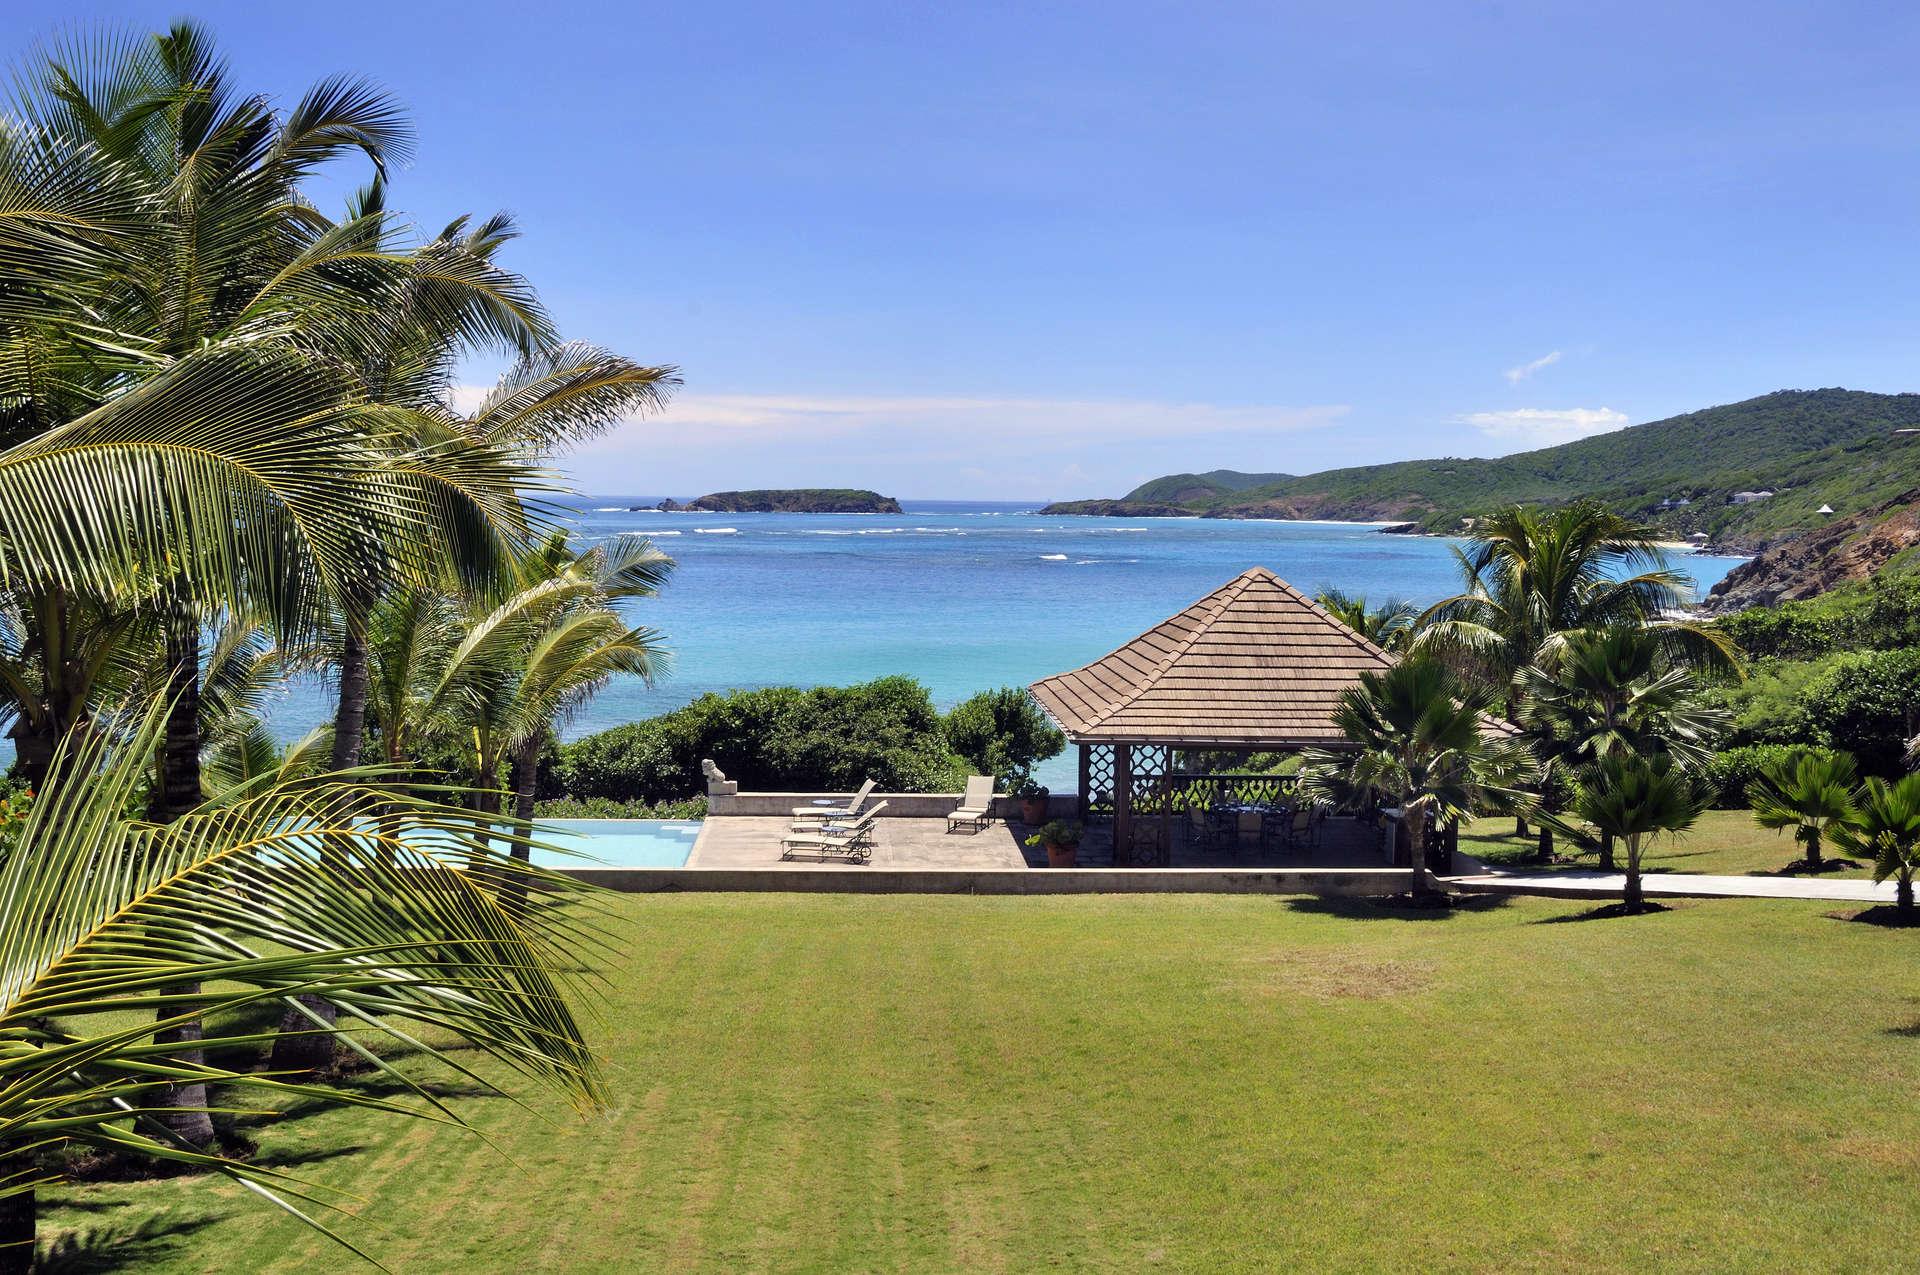 Luxury villa rentals caribbean - St vincent and the grenadines - St vincent - Mustique - Sleeping Dragon - Image 1/13